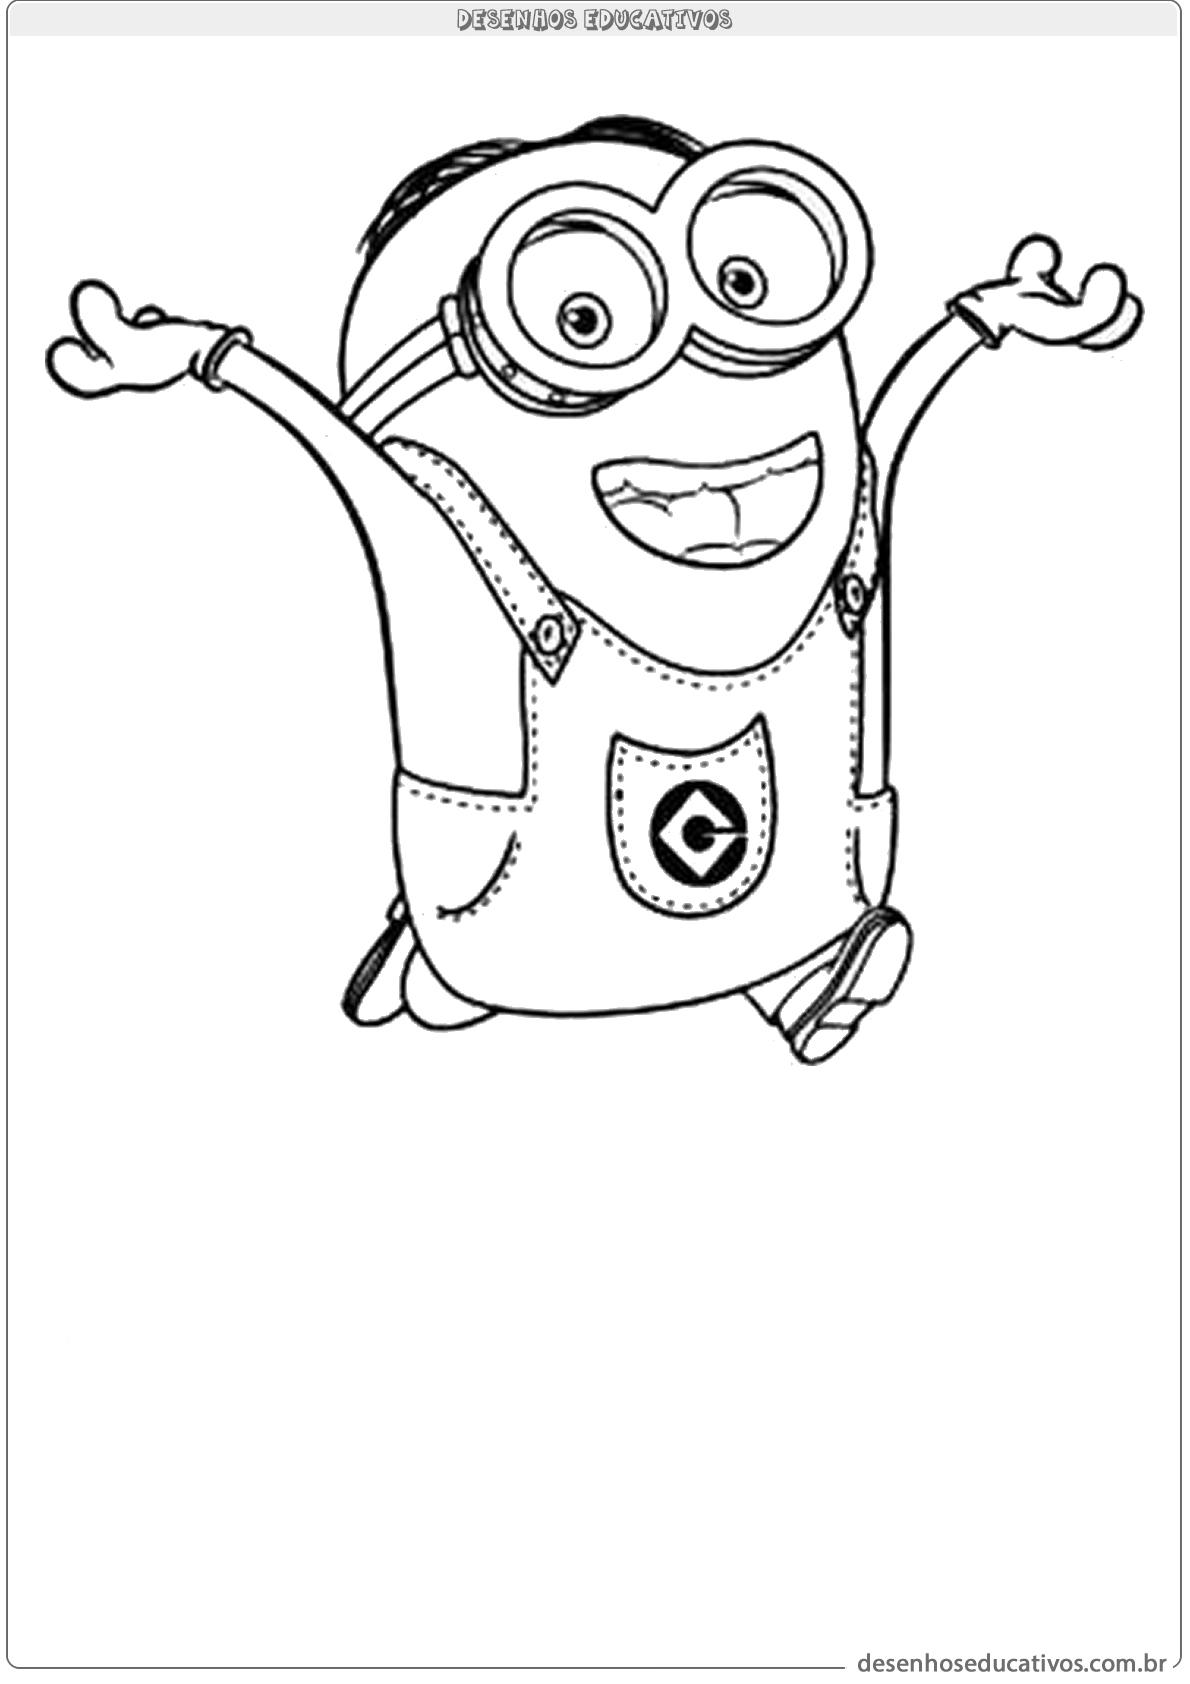 Desenhos Educativos Para Colorir Minions Desenhos Educativos